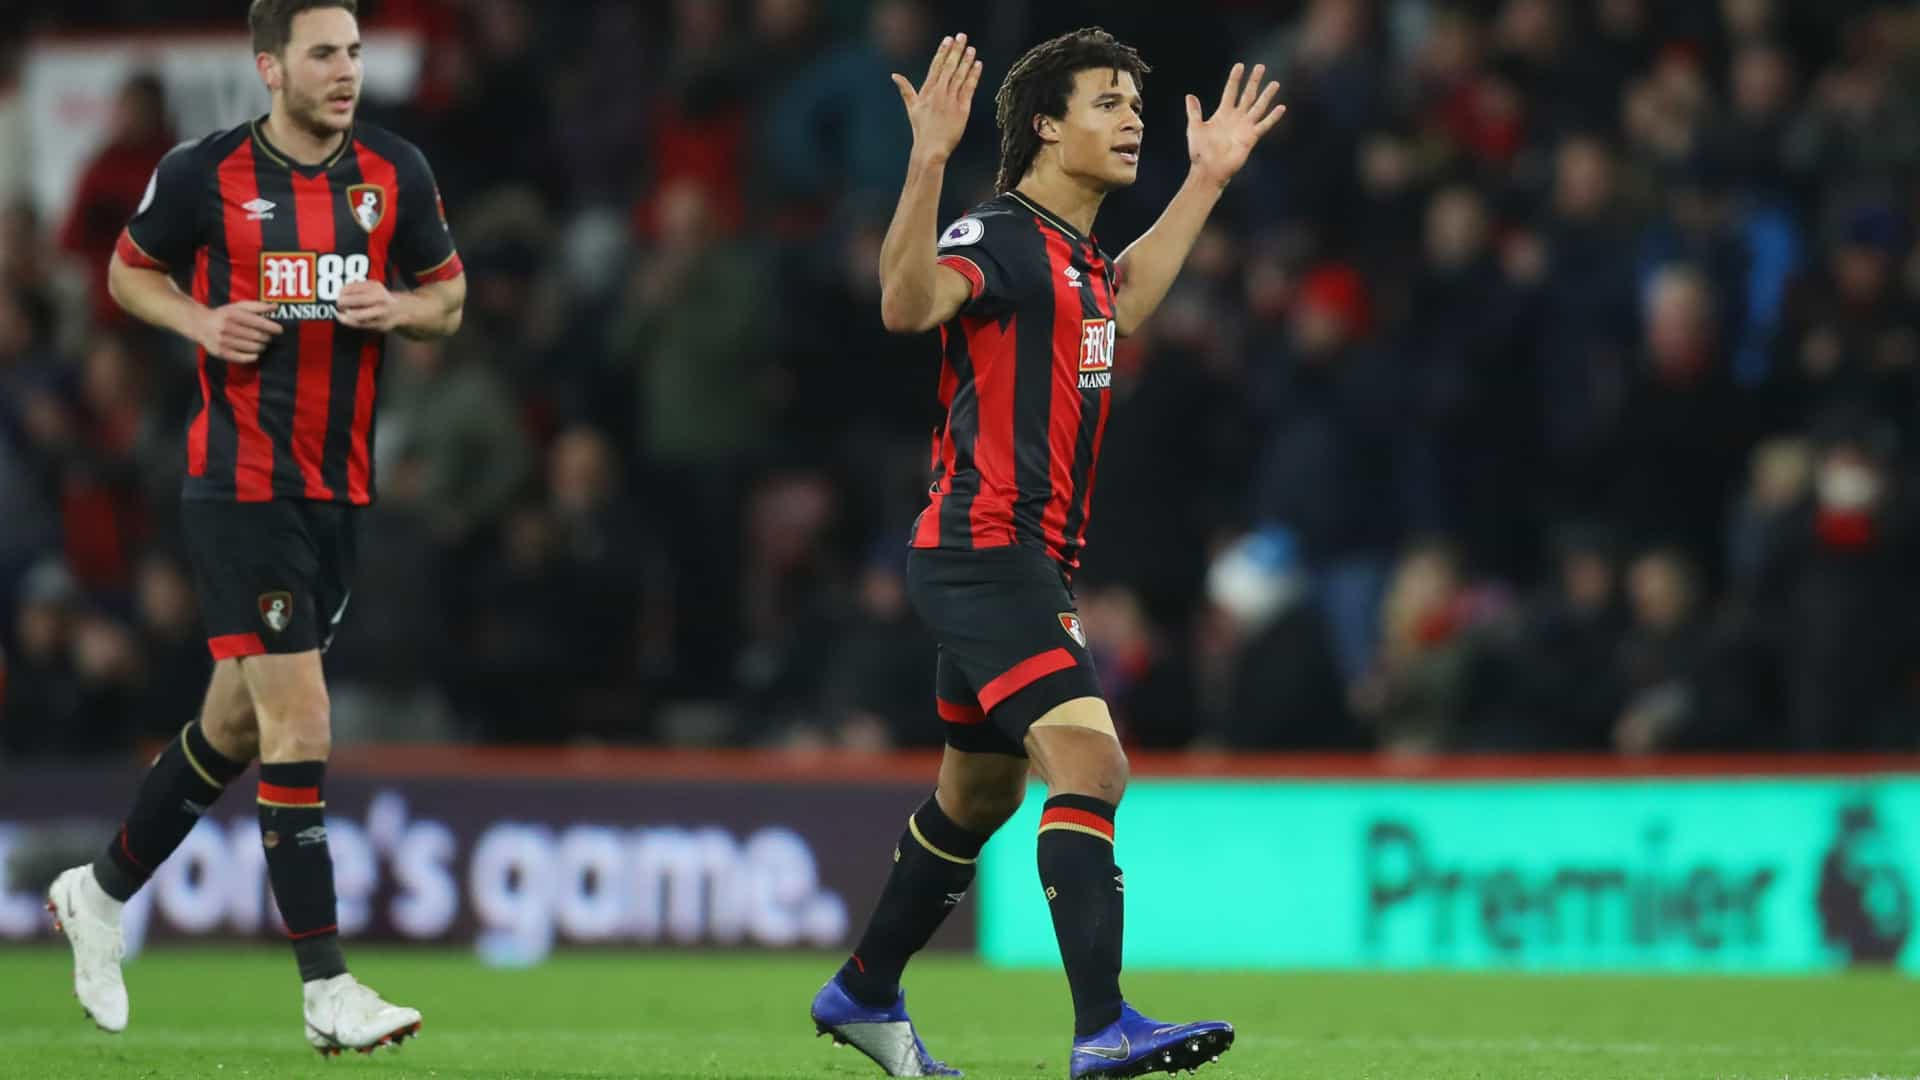 Chelsea vai abrir 'cordões à bolsa' para recuperar Nathan Aké